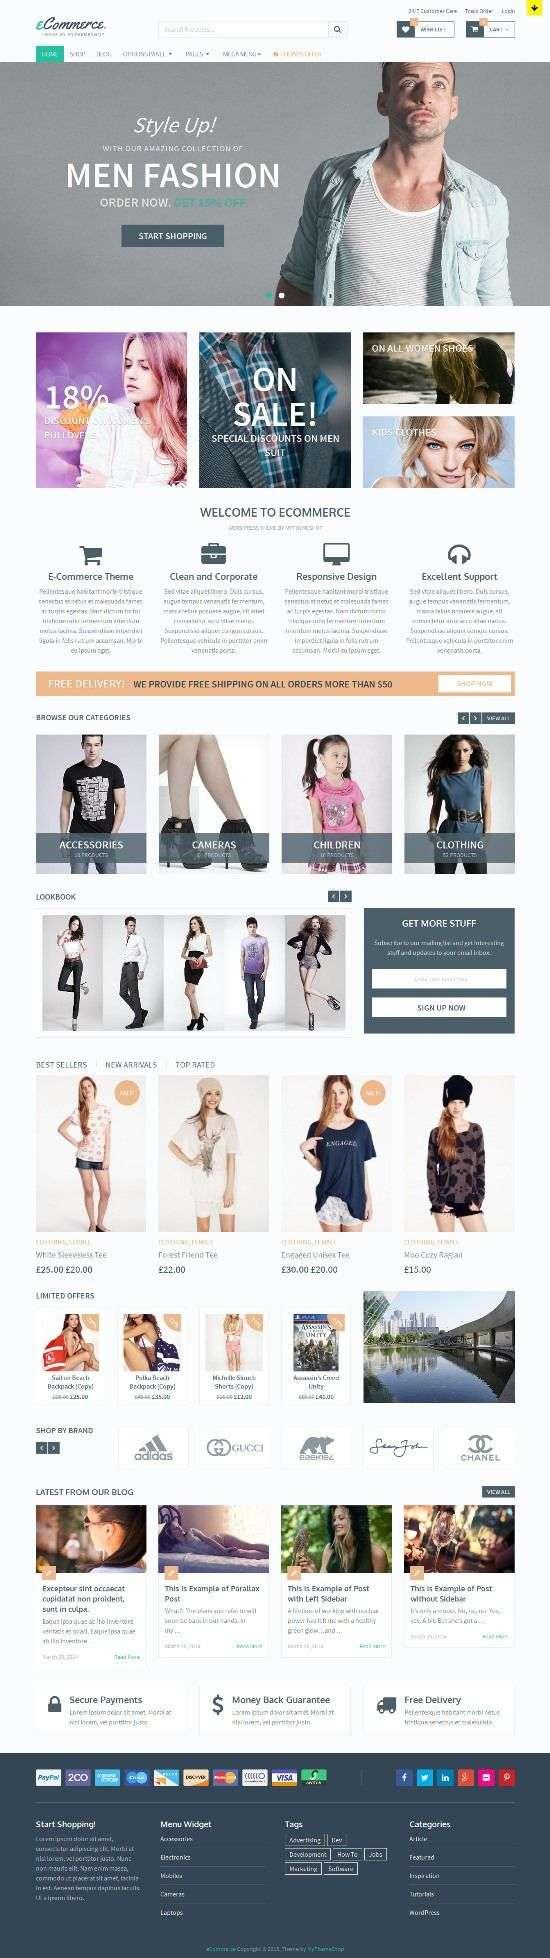 ecommerce mythemeshop wordpress theme 01 - MyThemeShop eCommerce WordPress Theme